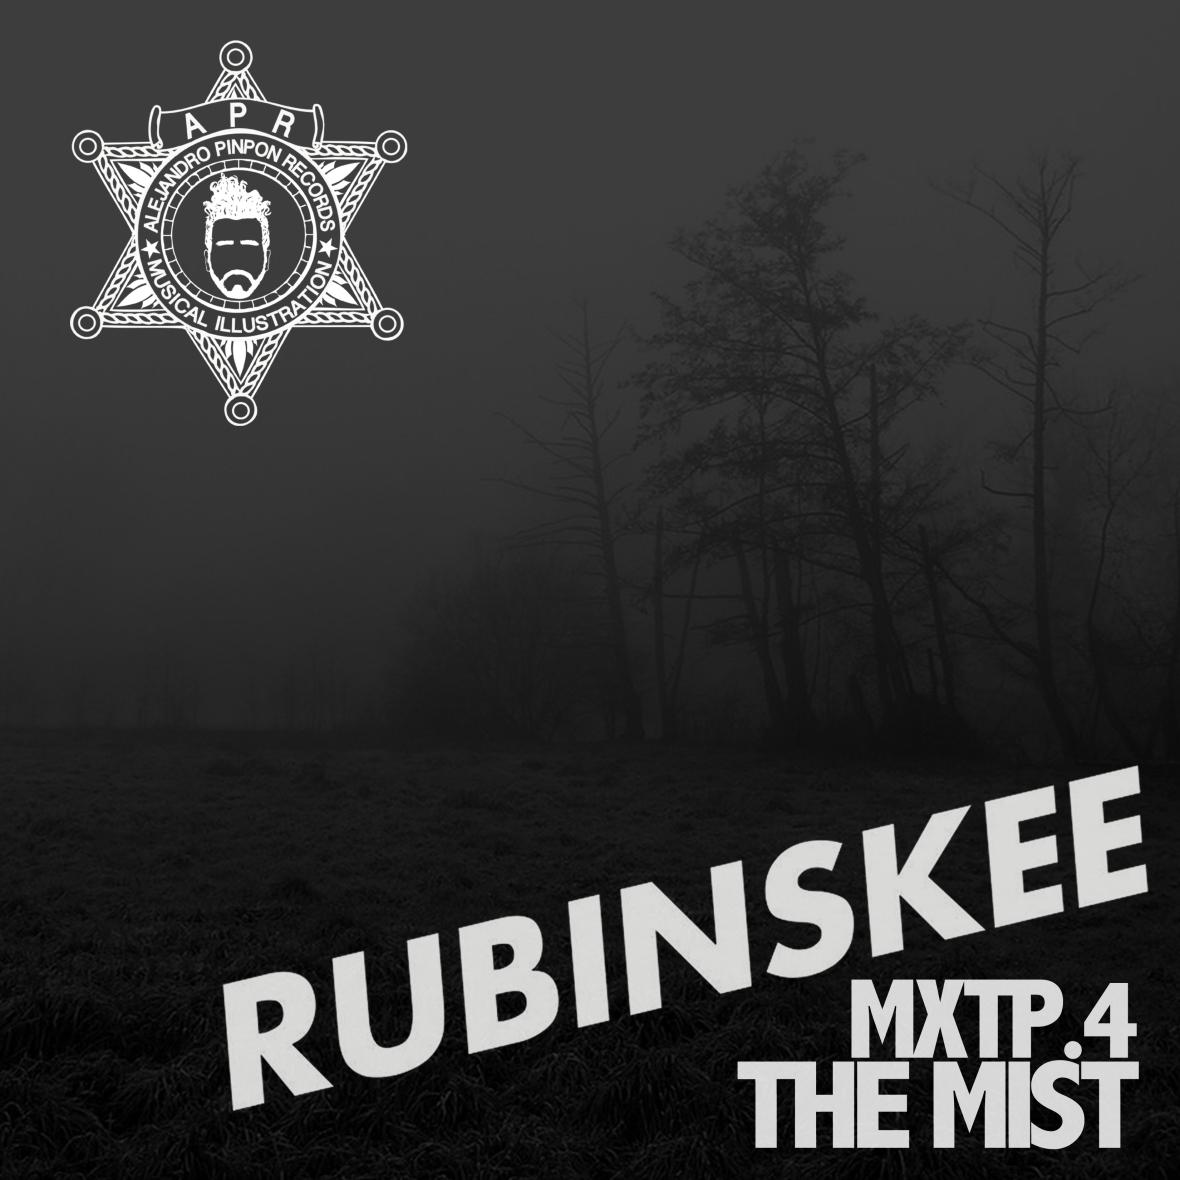 mxtp.4-the mist-rubinskee-alejandro pinpon records.jpg